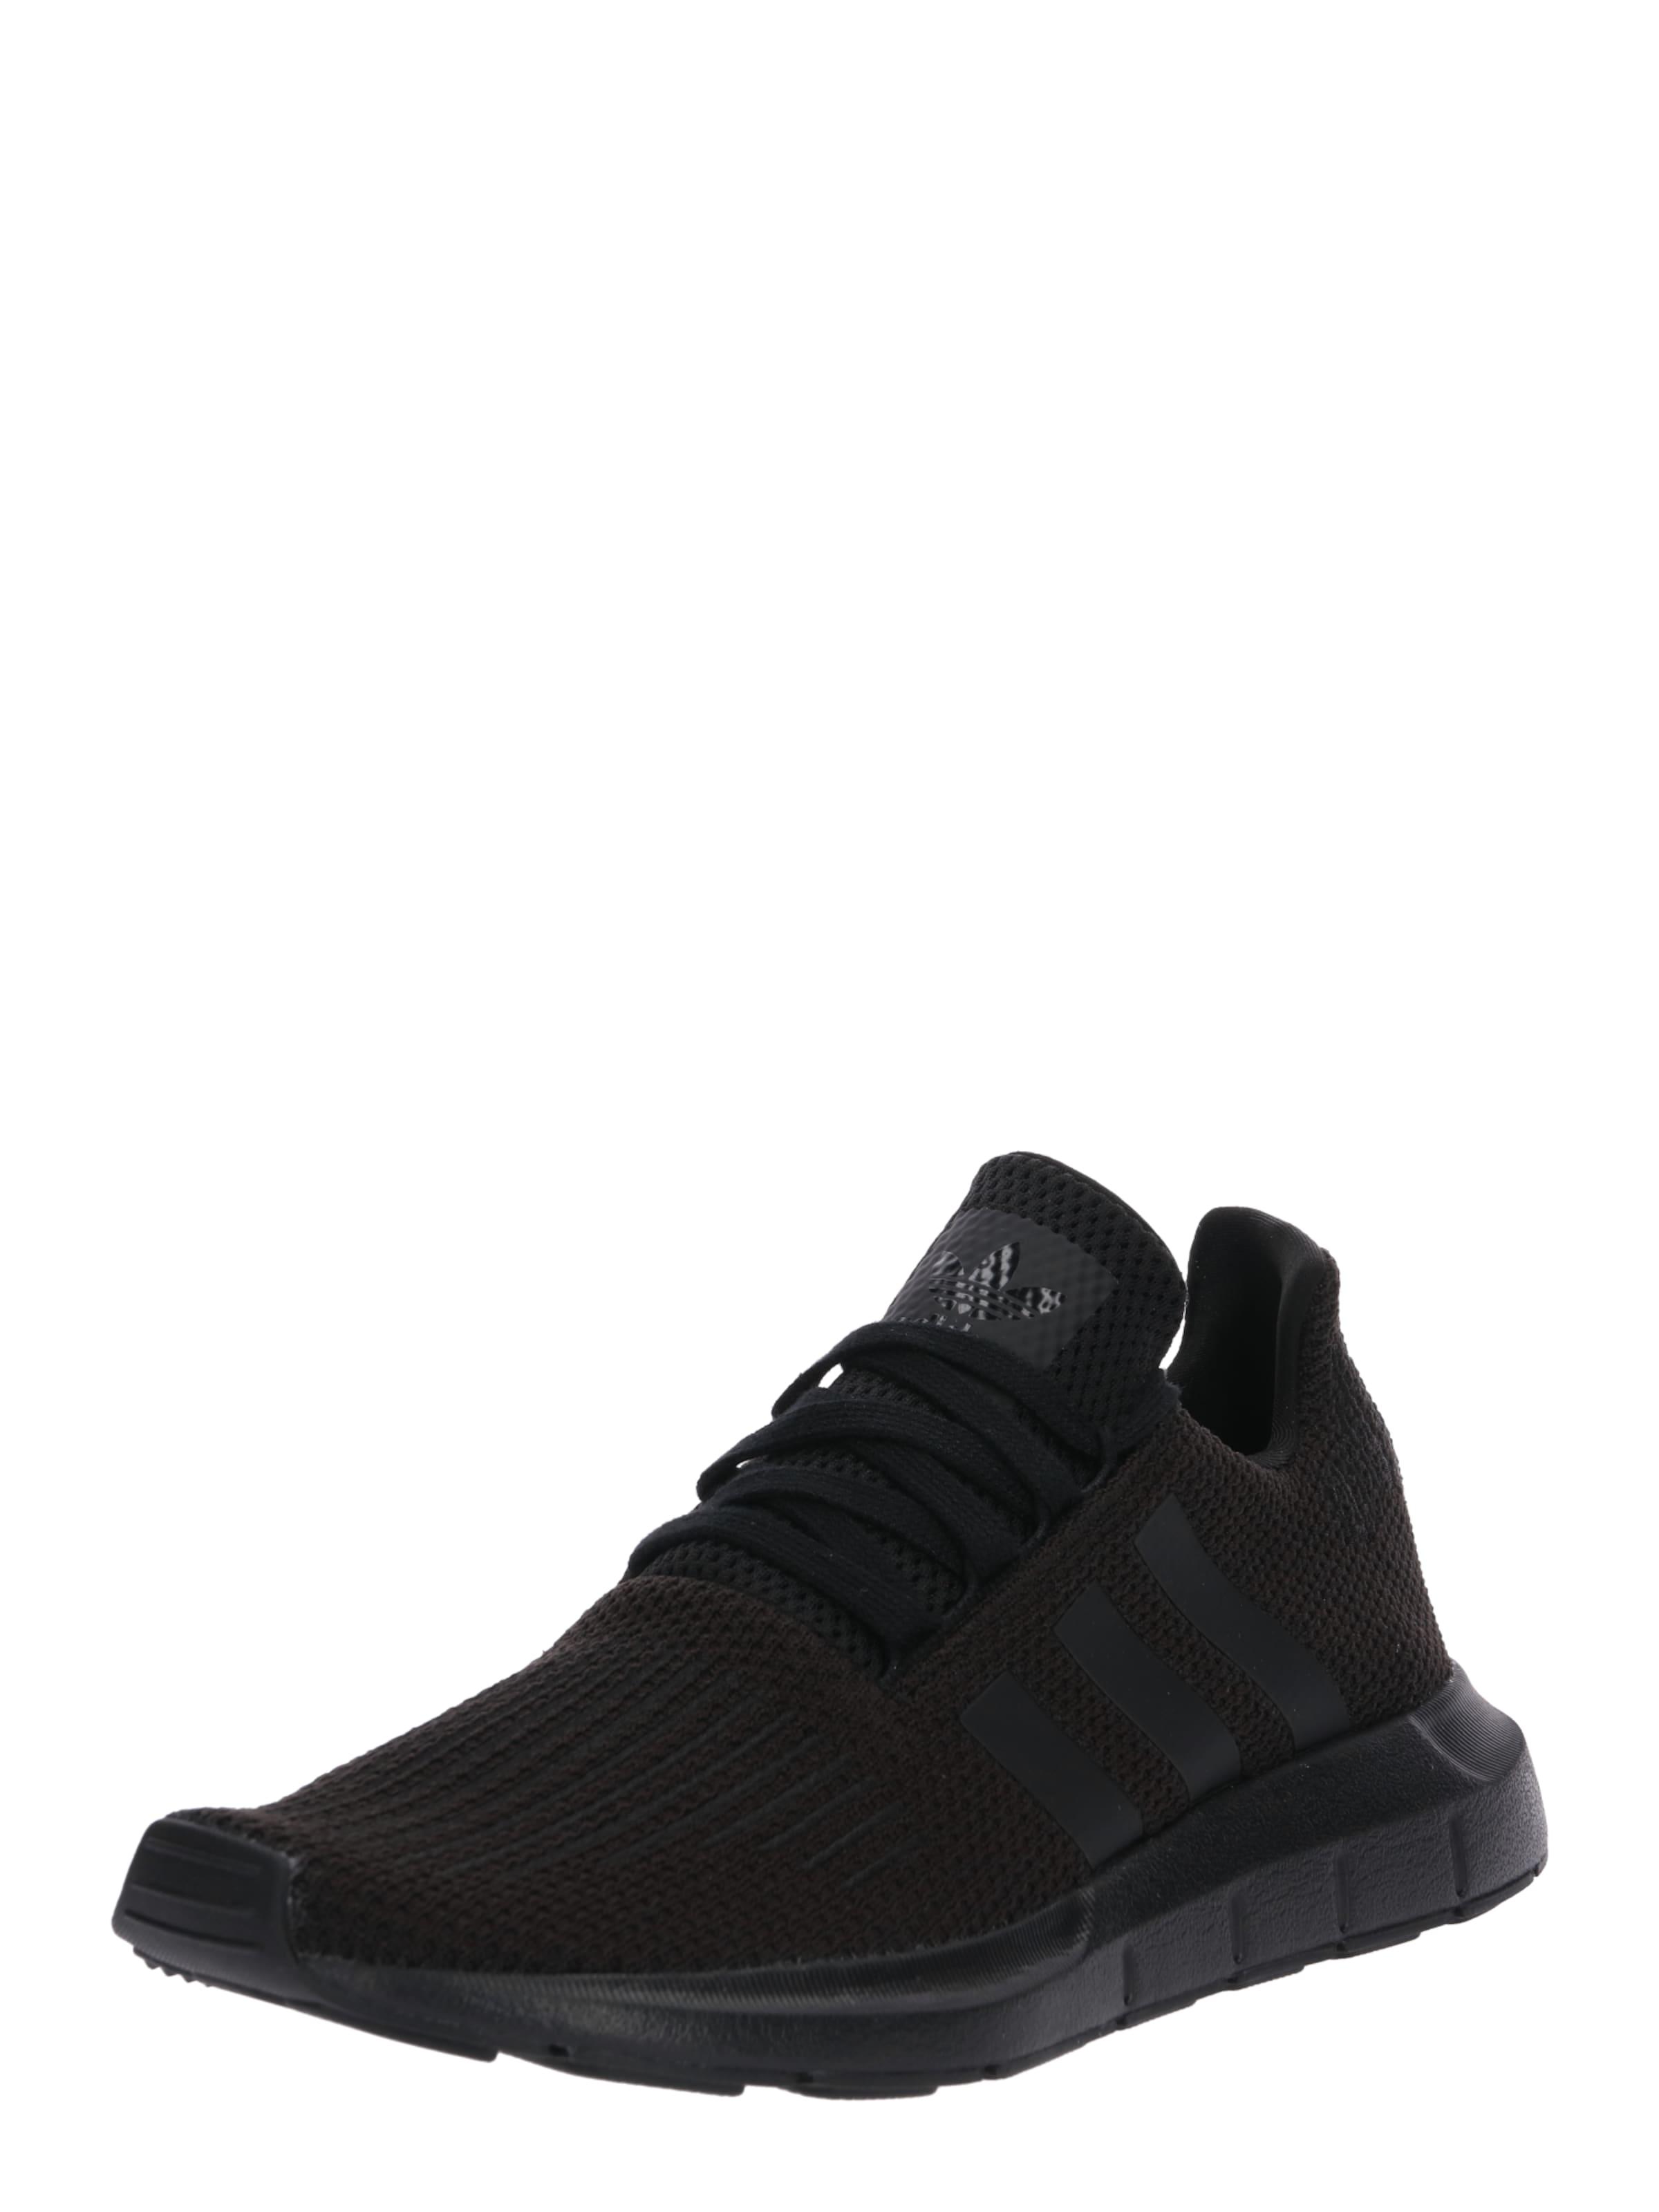 Run' Baskets Basses 'swift Noir En Adidas Originals qEwIFF